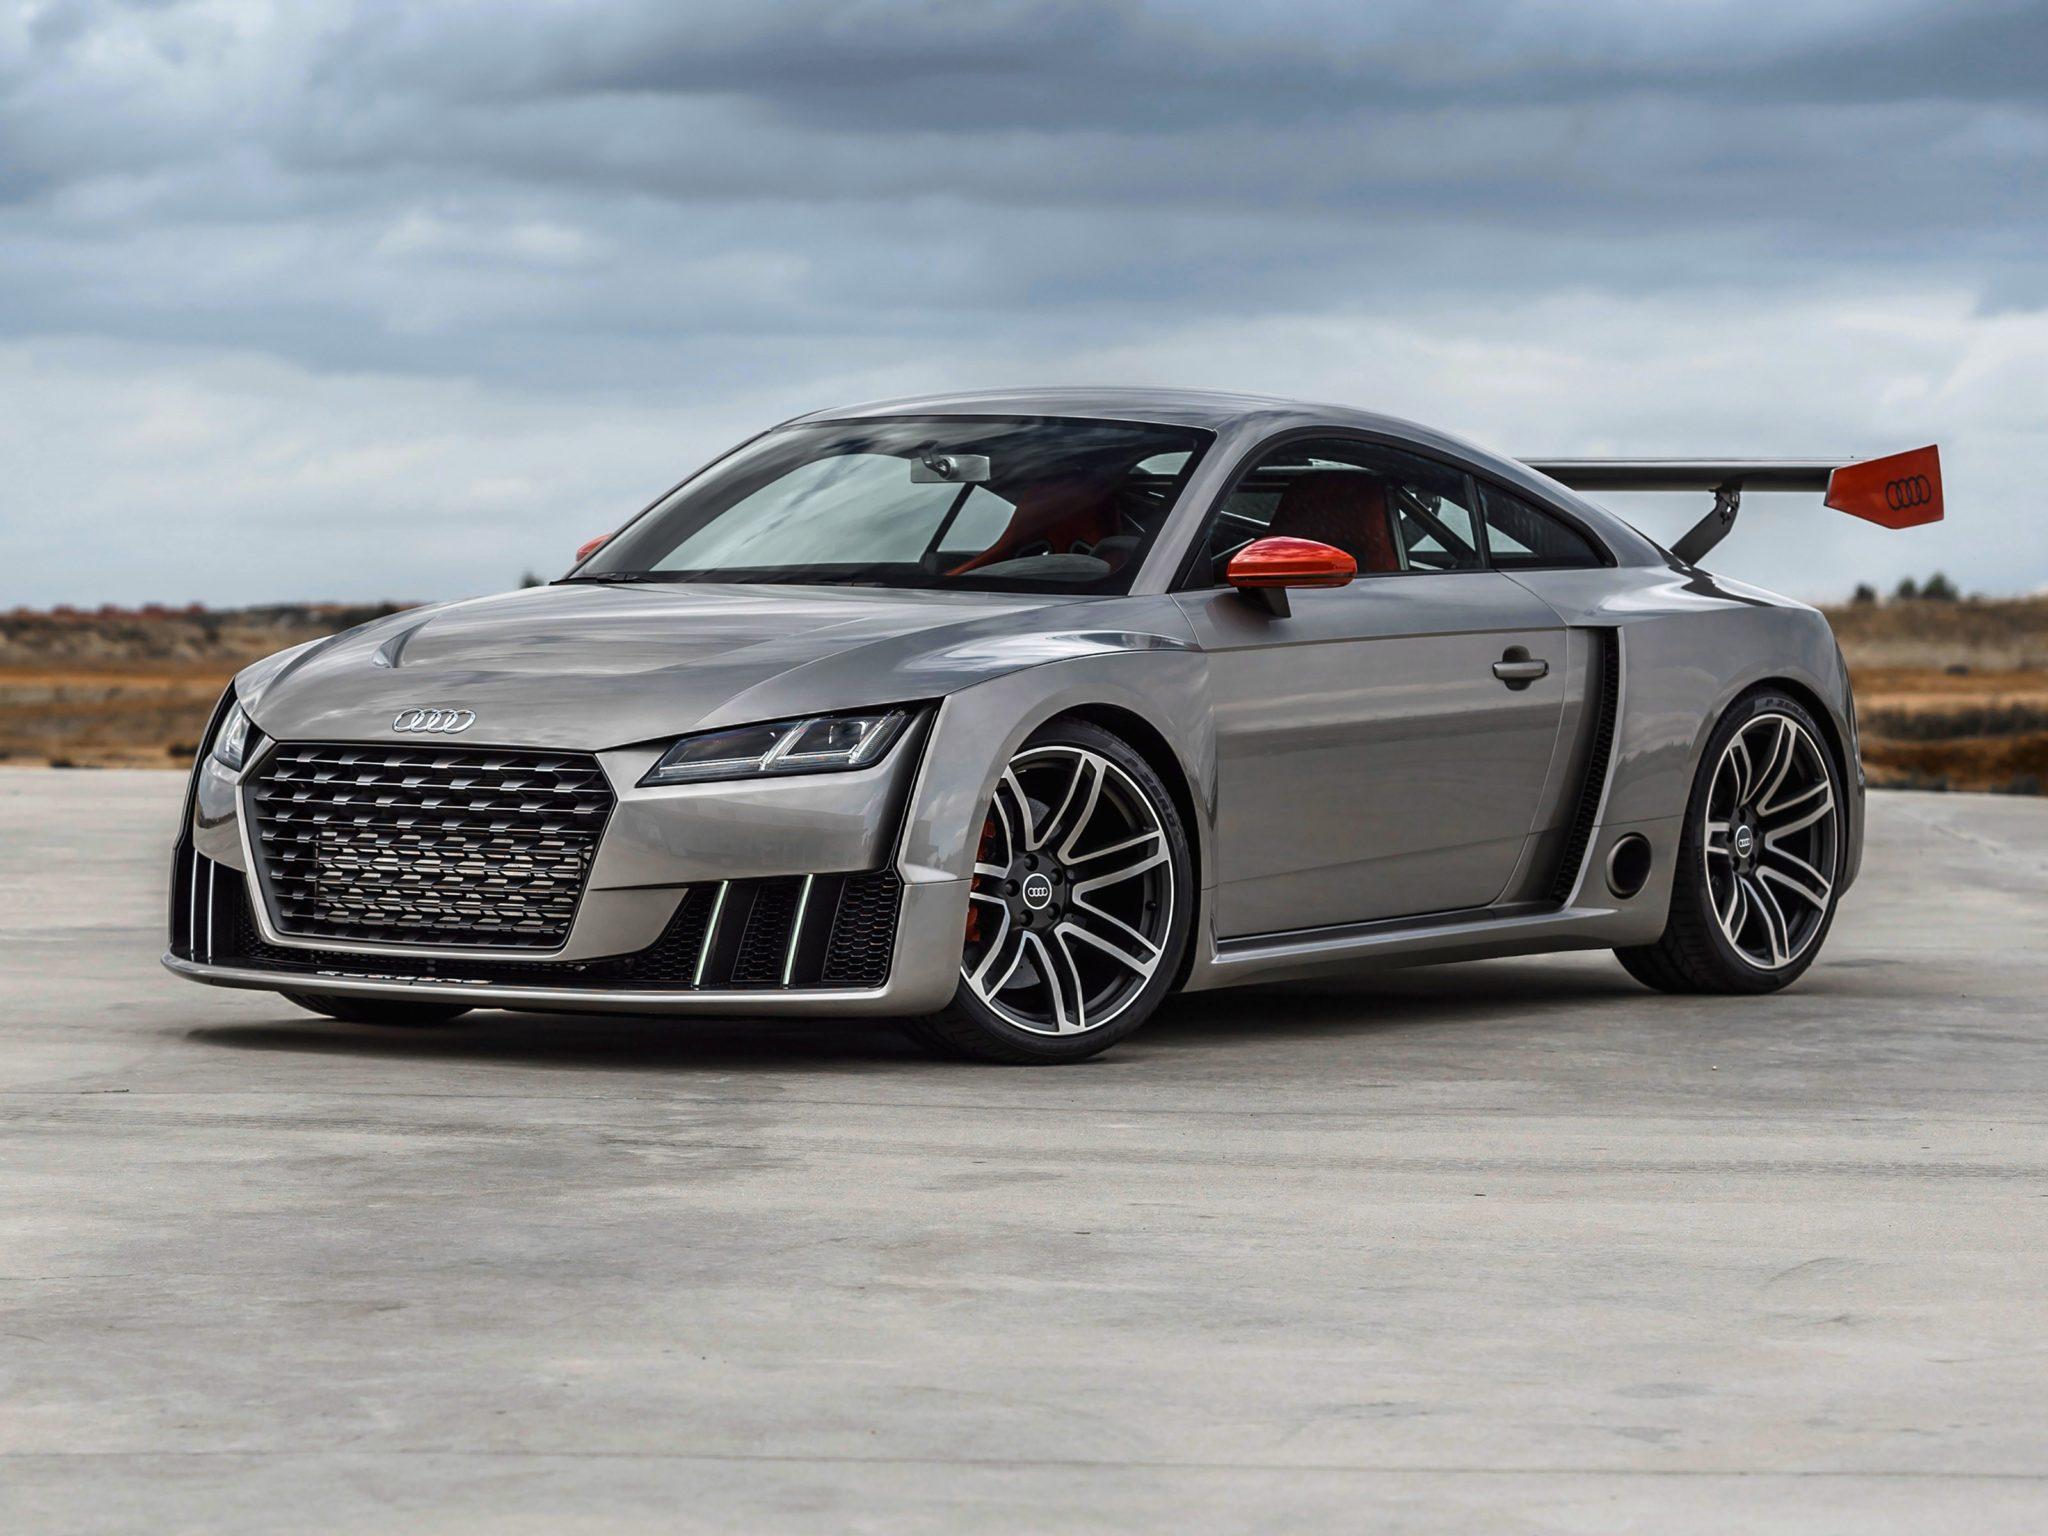 Audi TT Clubsport Turbo Concept 2015